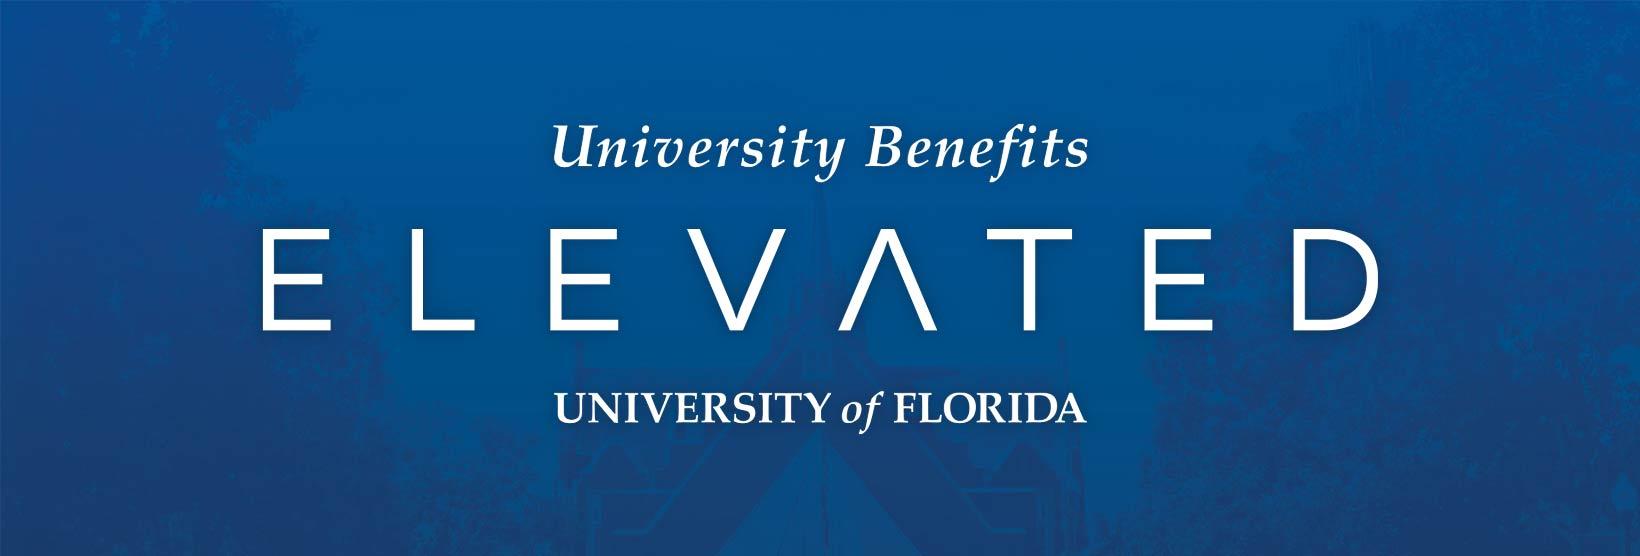 University Benefits Elevated